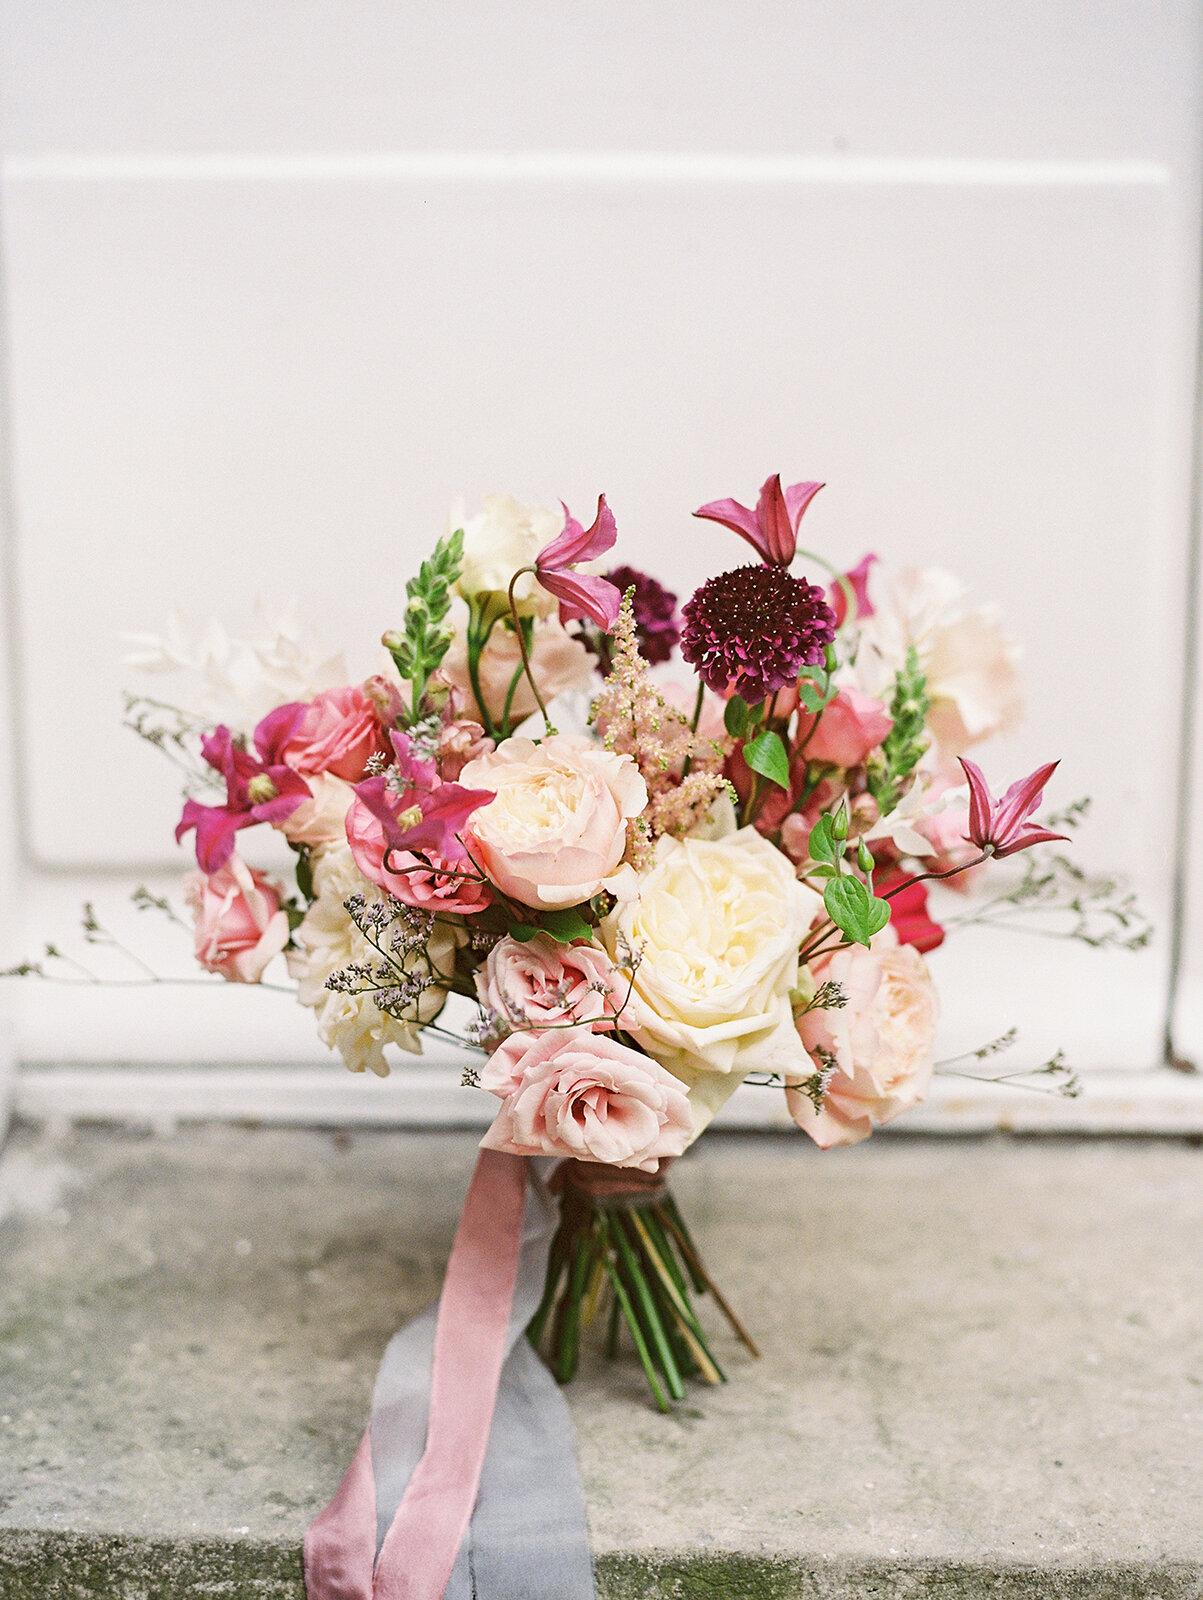 pink-small-bride-bouquet-williamsburg-photo-studios